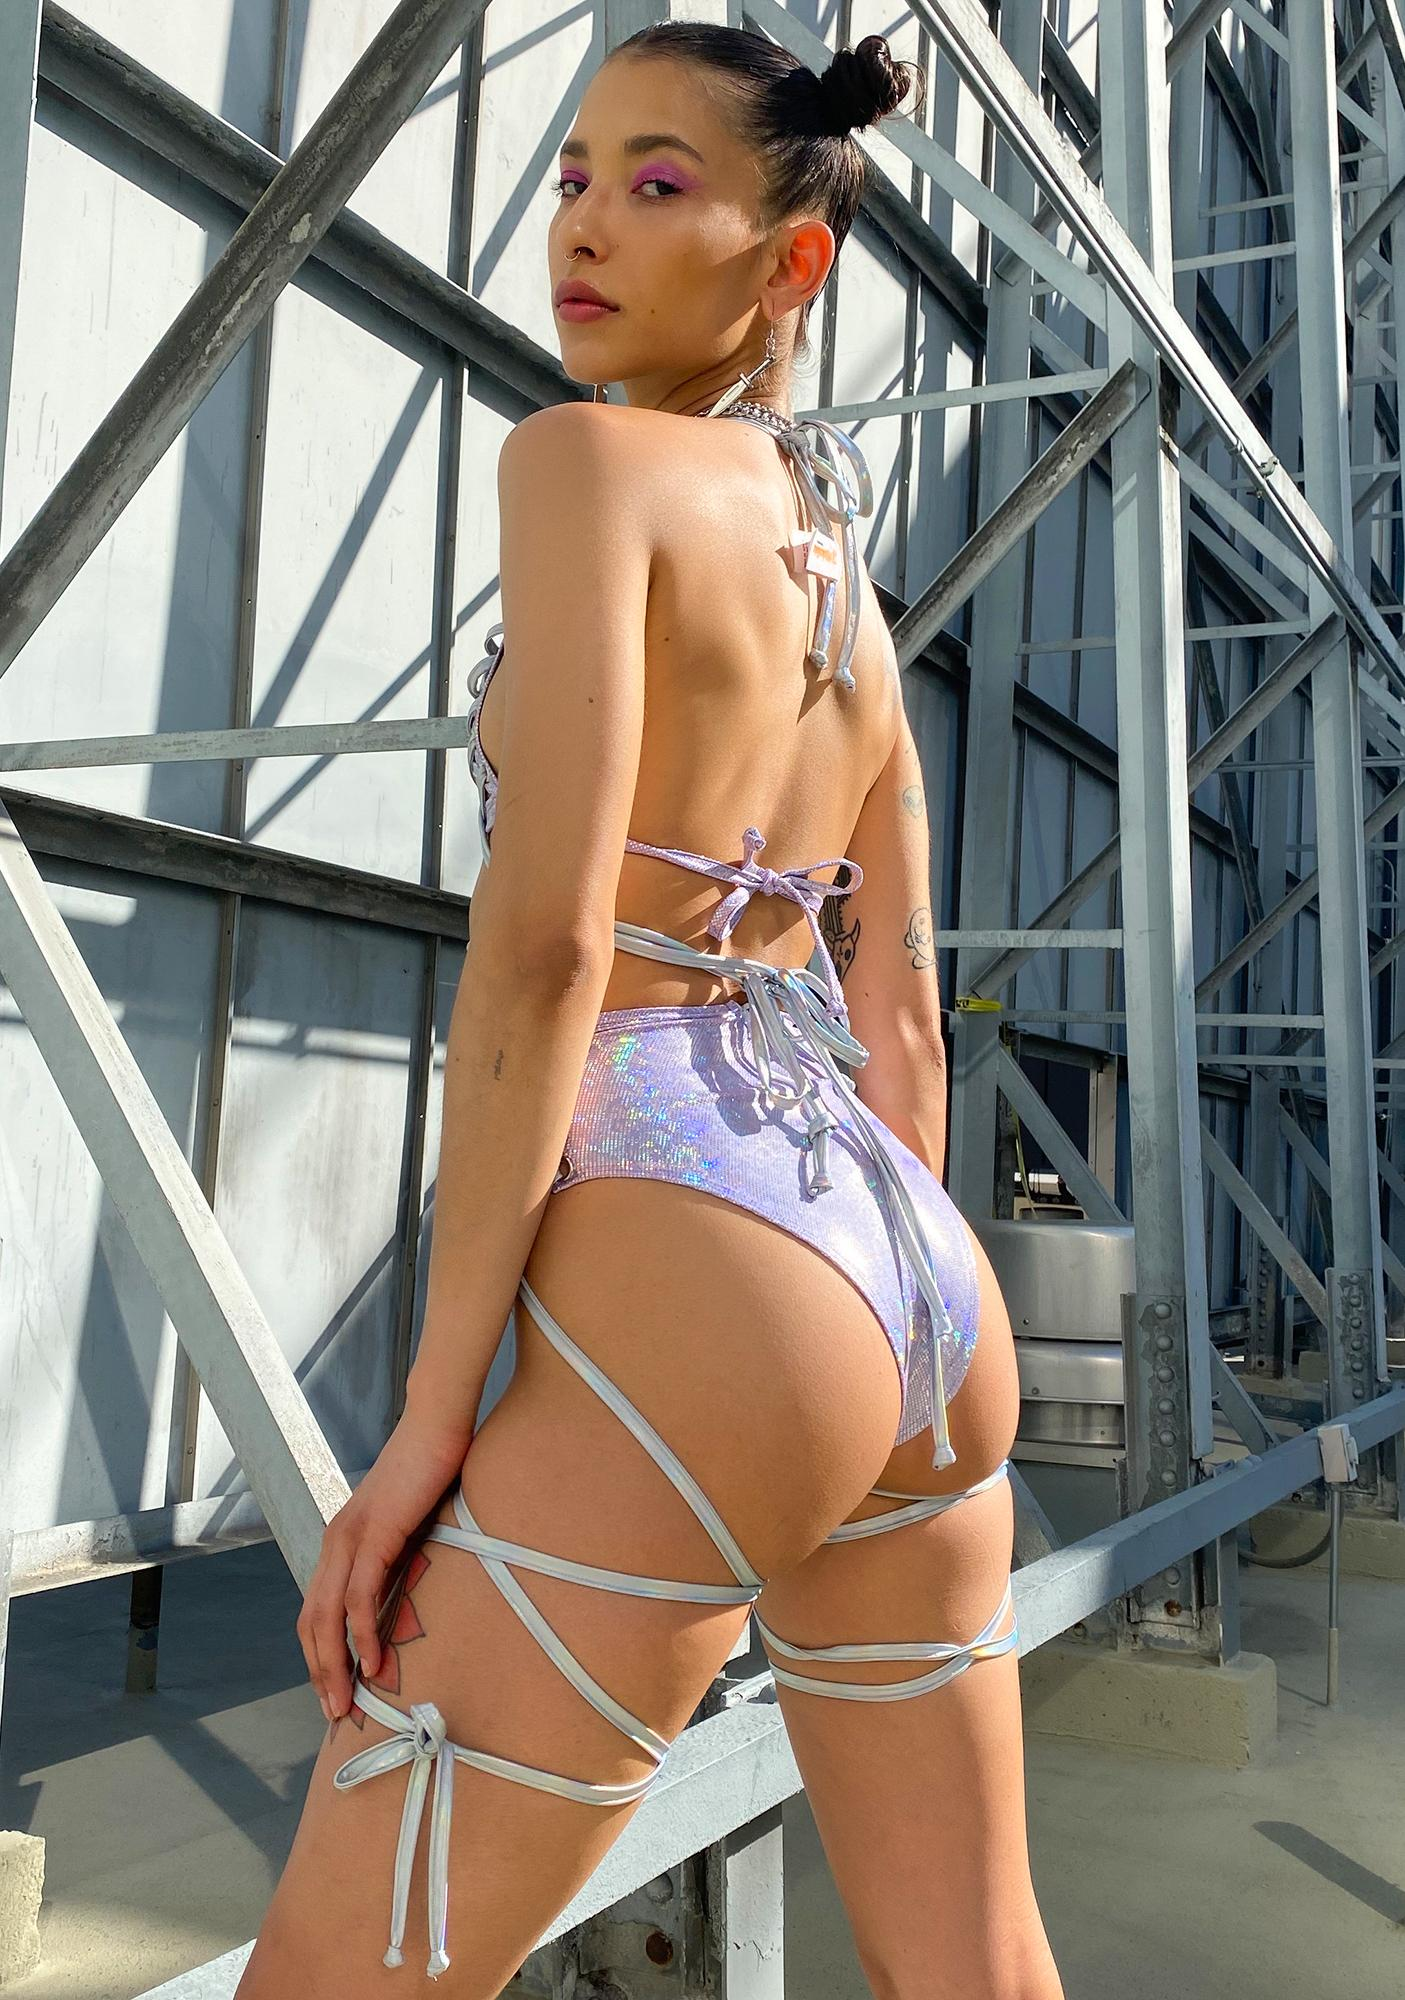 J Valentine Lace Up Metallic Booty Shorts